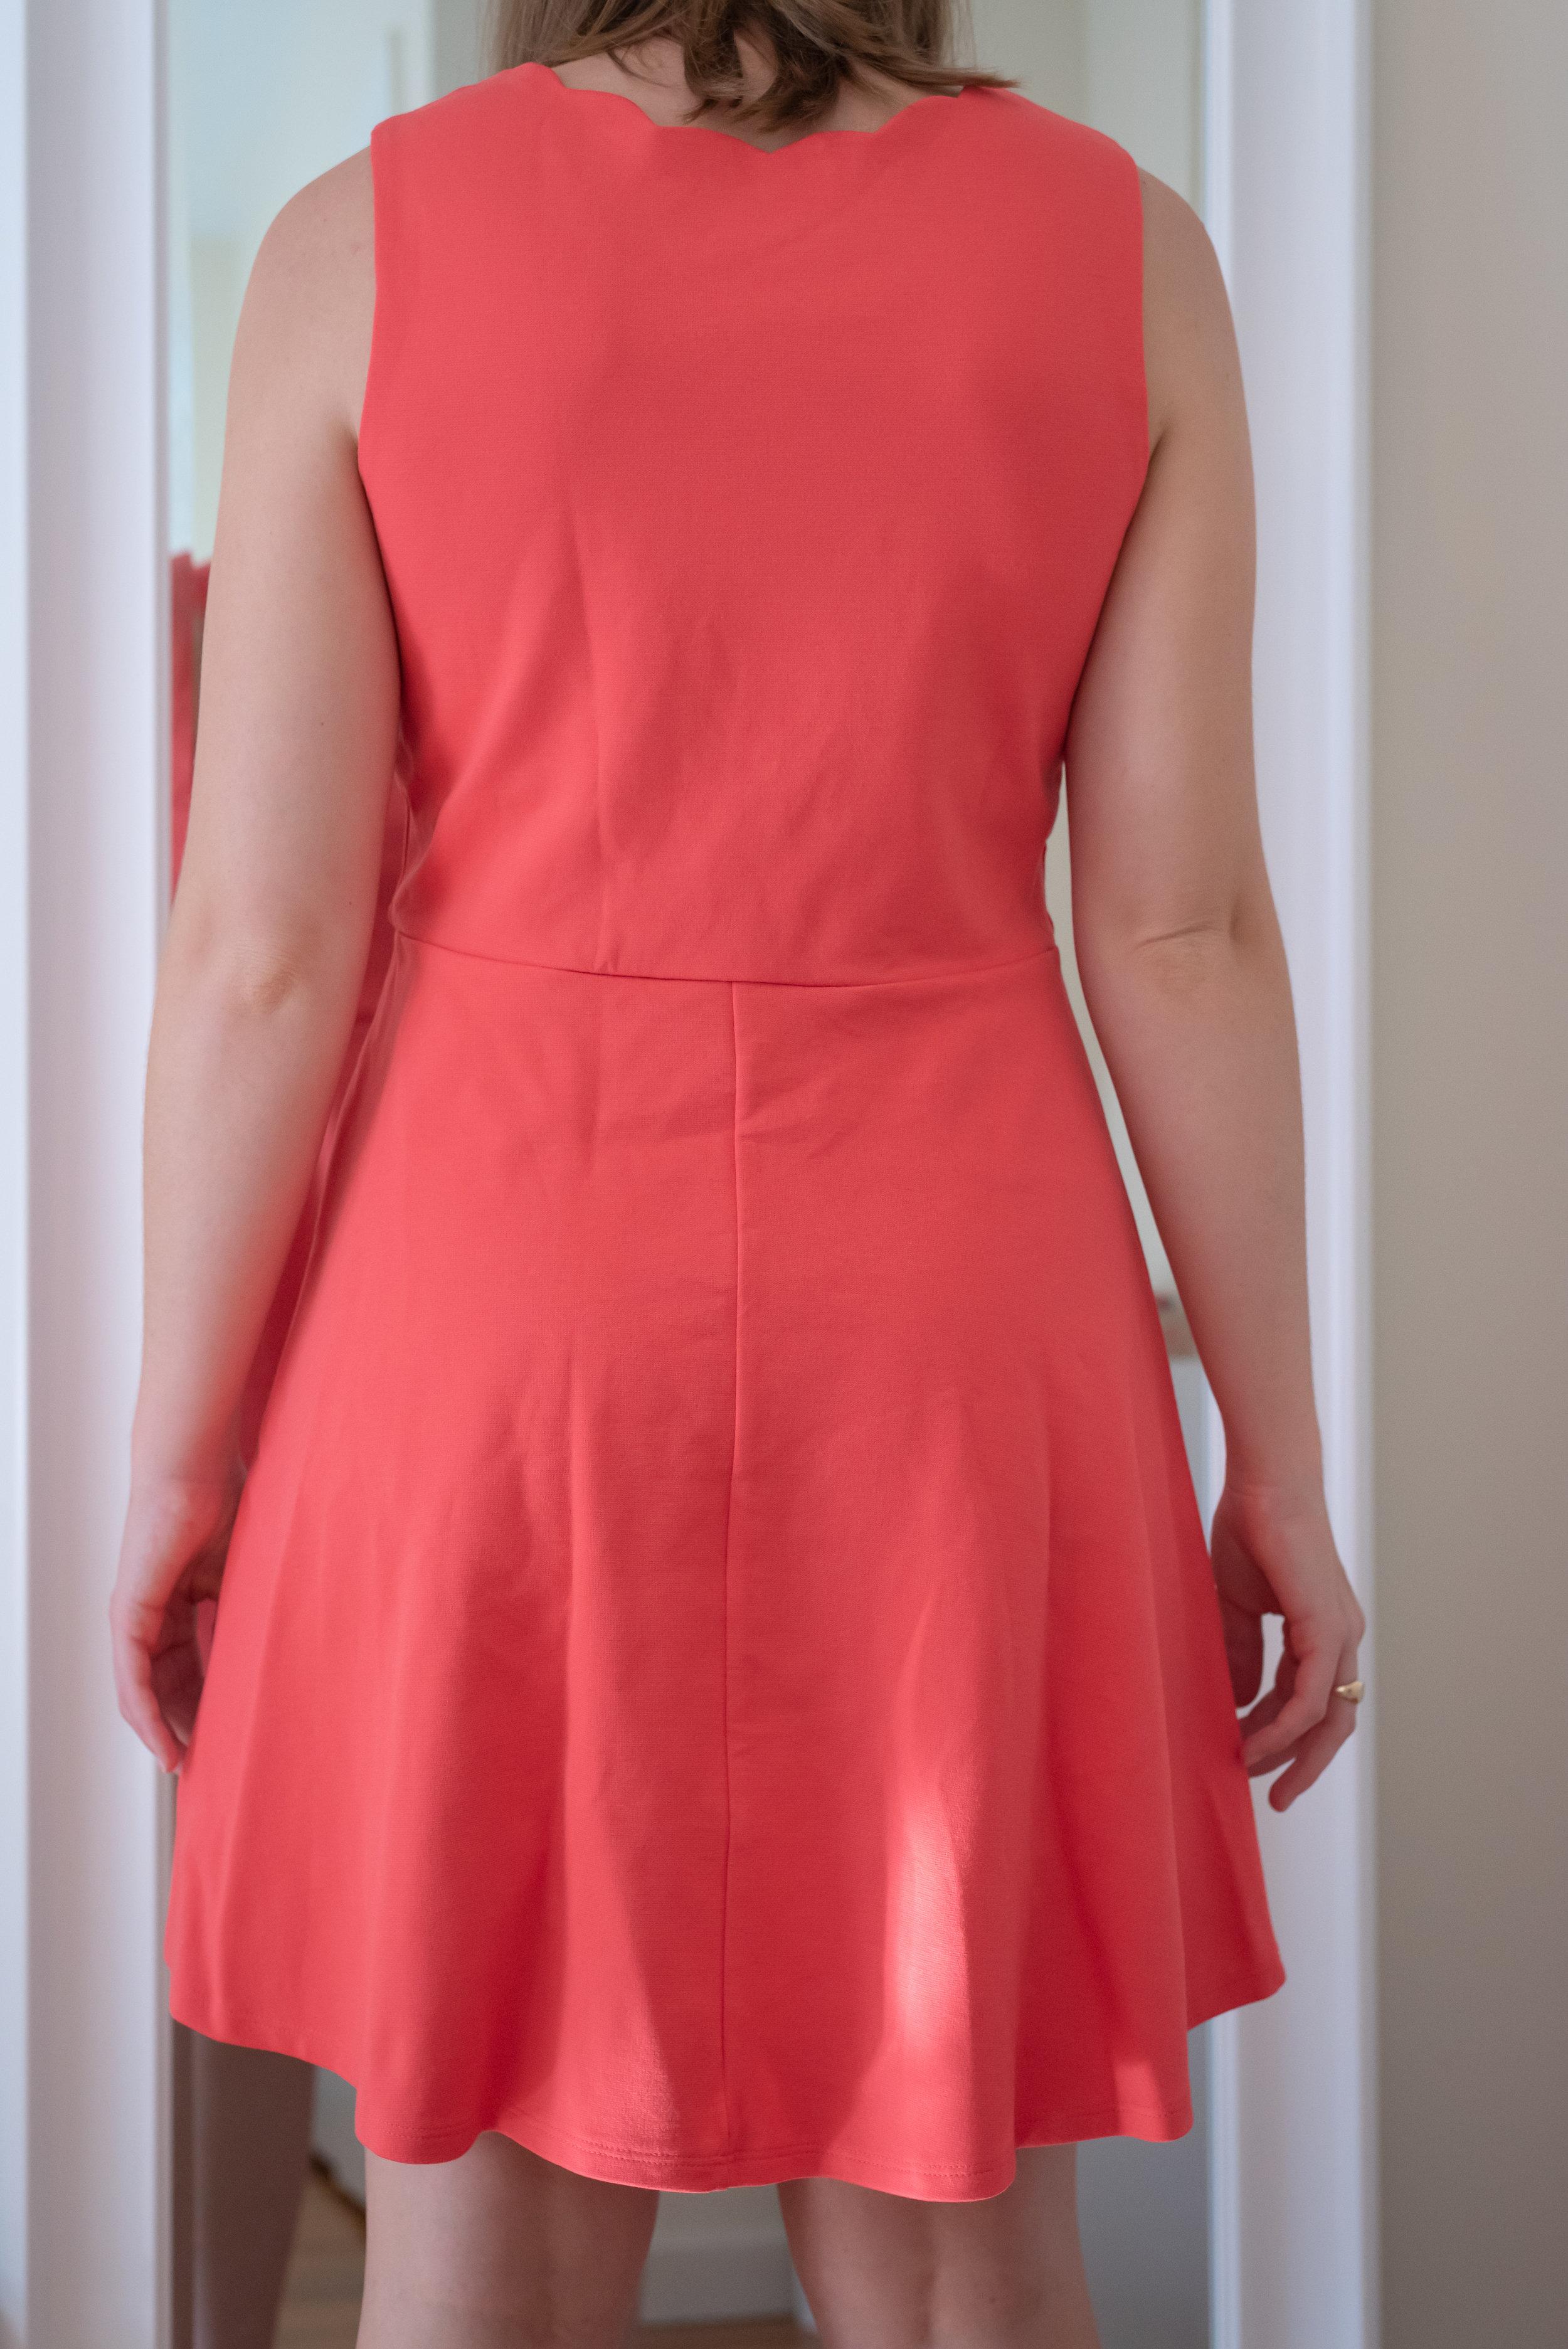 Monteau Petite Scalloped Fit & Flare Dress - Size Petite M - BACK